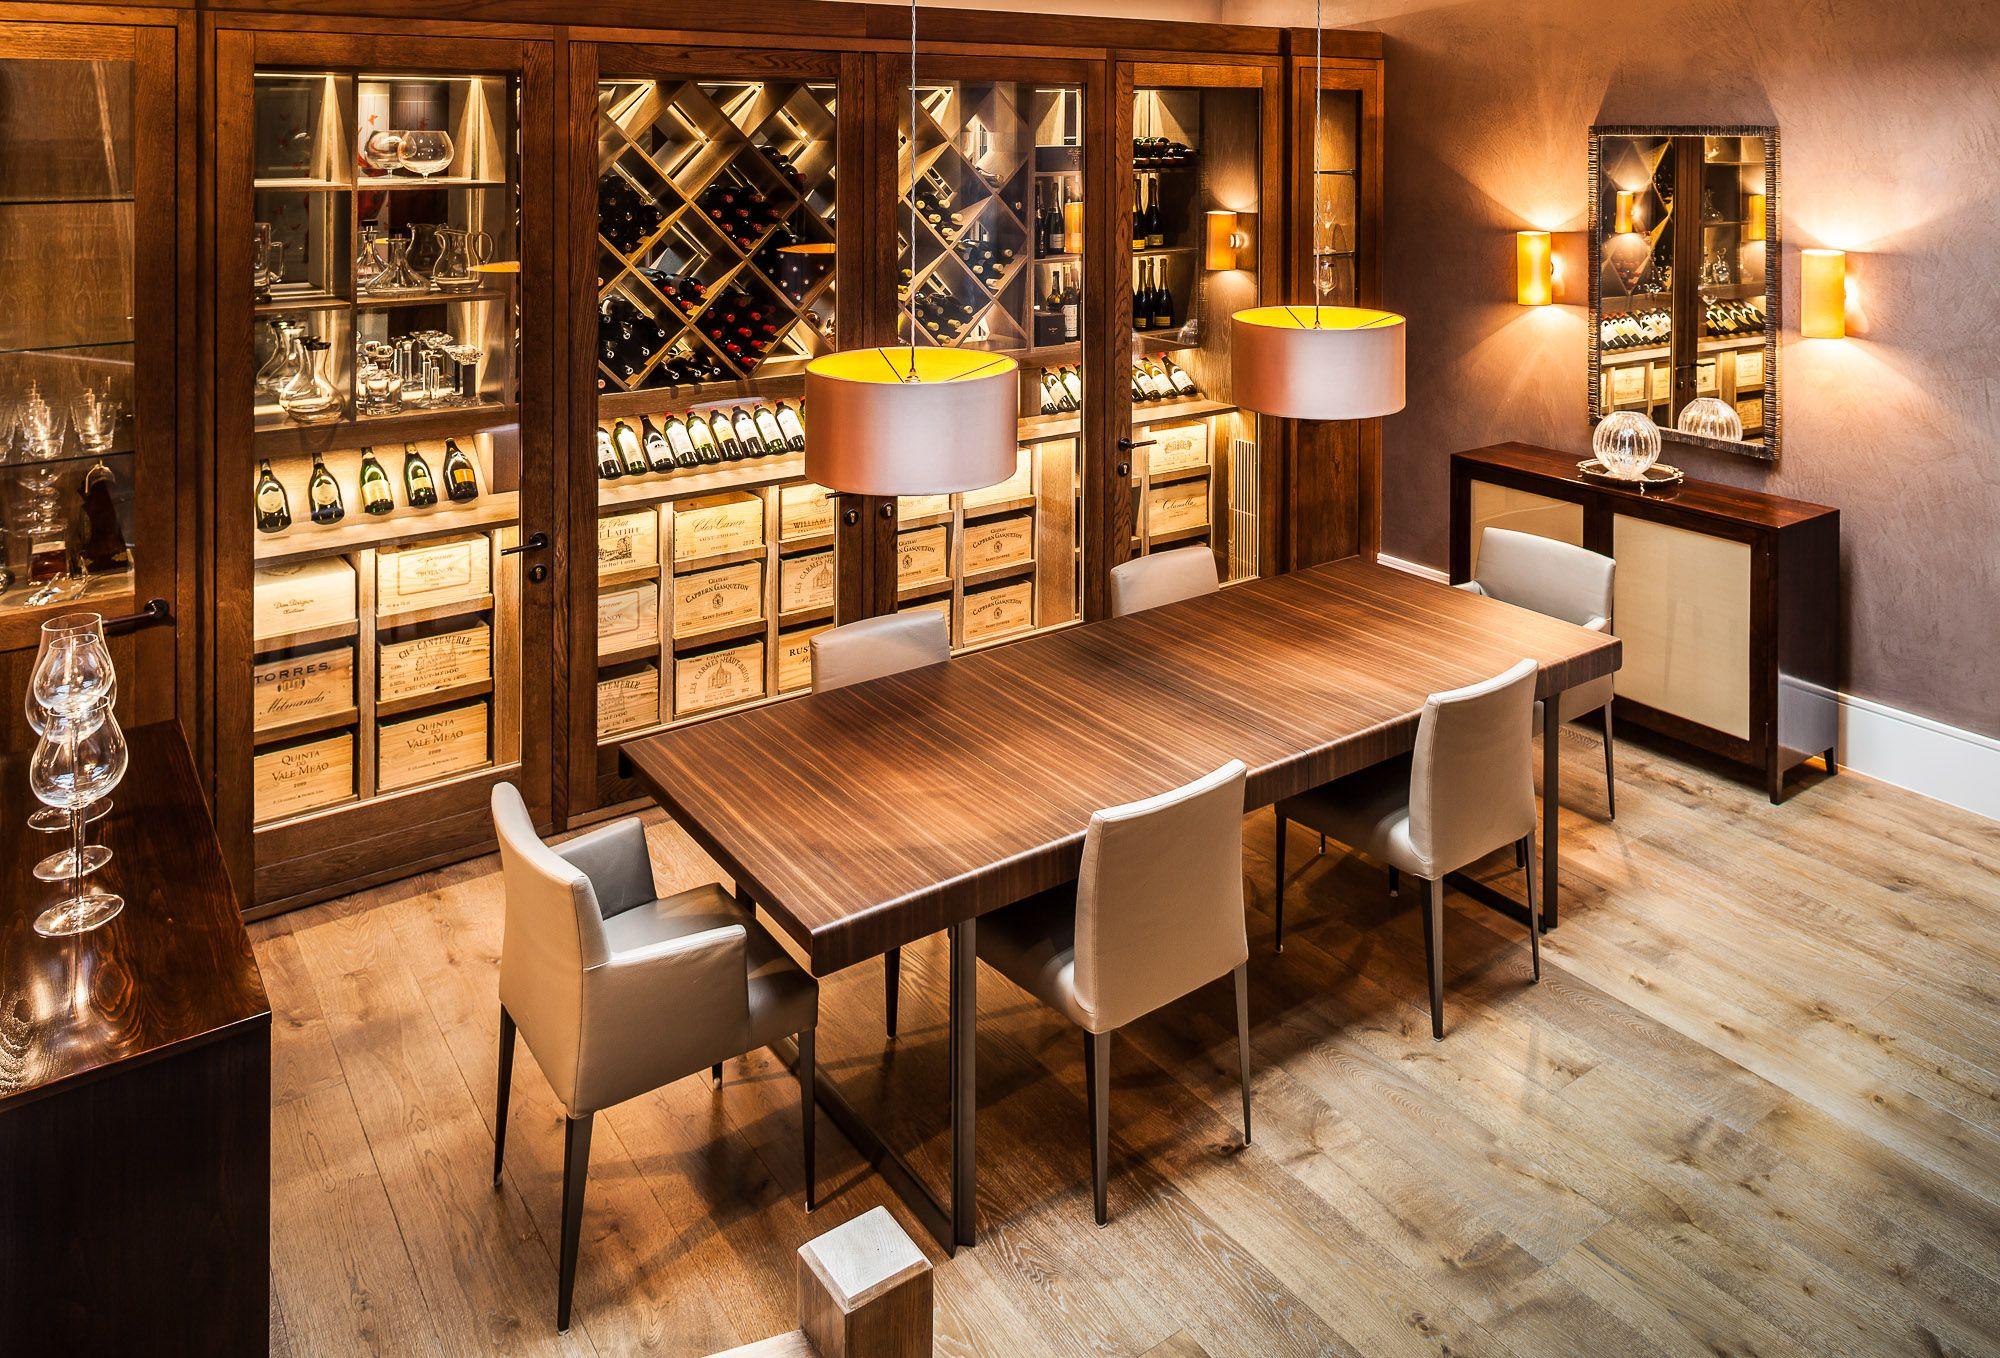 Quarrendonstg wine cellars and displays